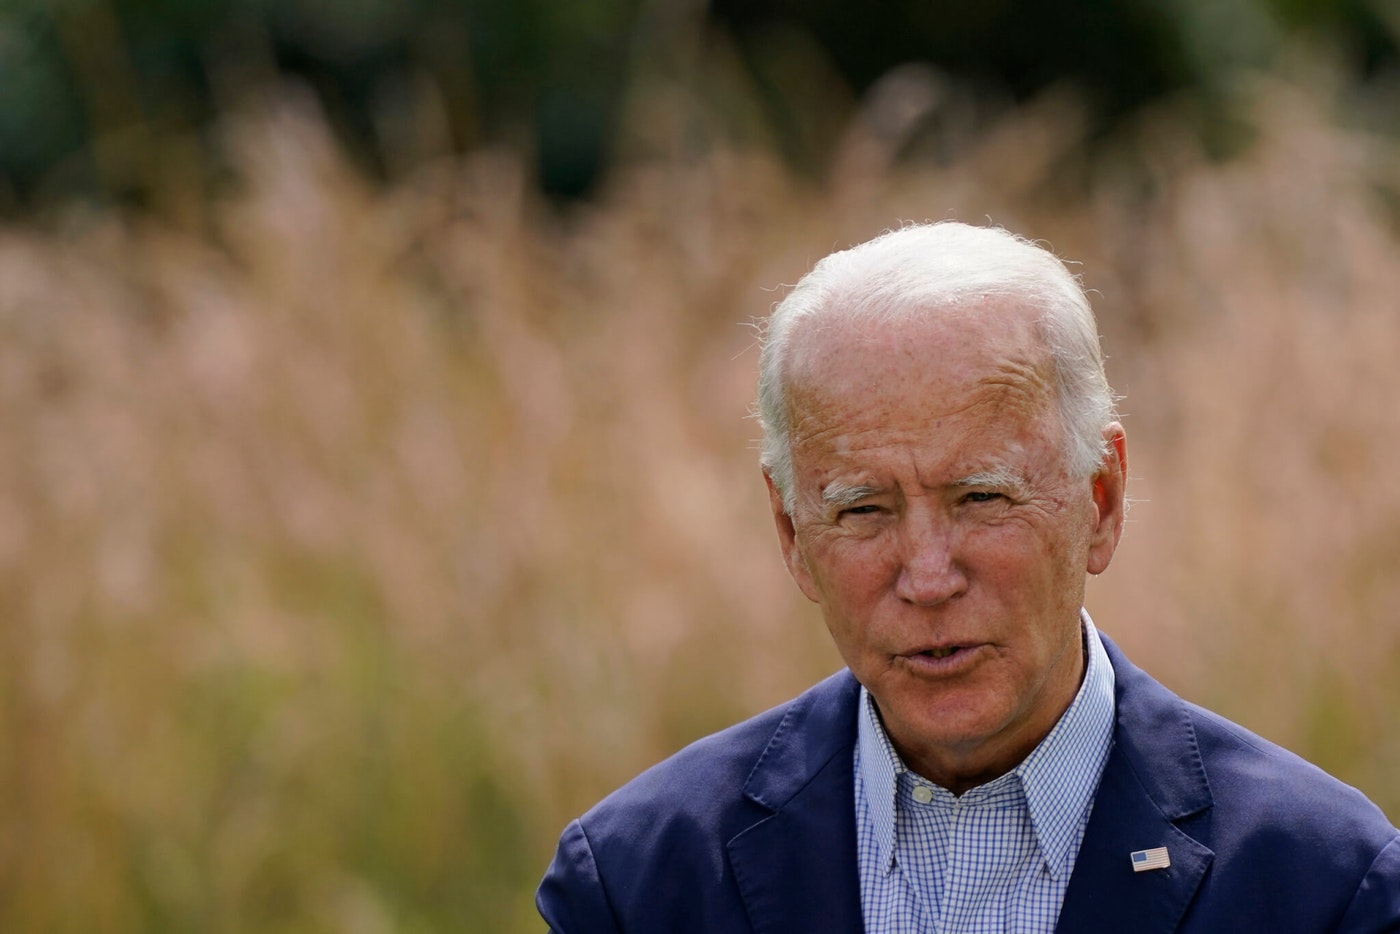 Democratic presidential candidate and former Vice President Joe Biden speaks Monday, Sept. 14, 2020, in Wilmington, Del. (AP Photo/Patrick Semansky)